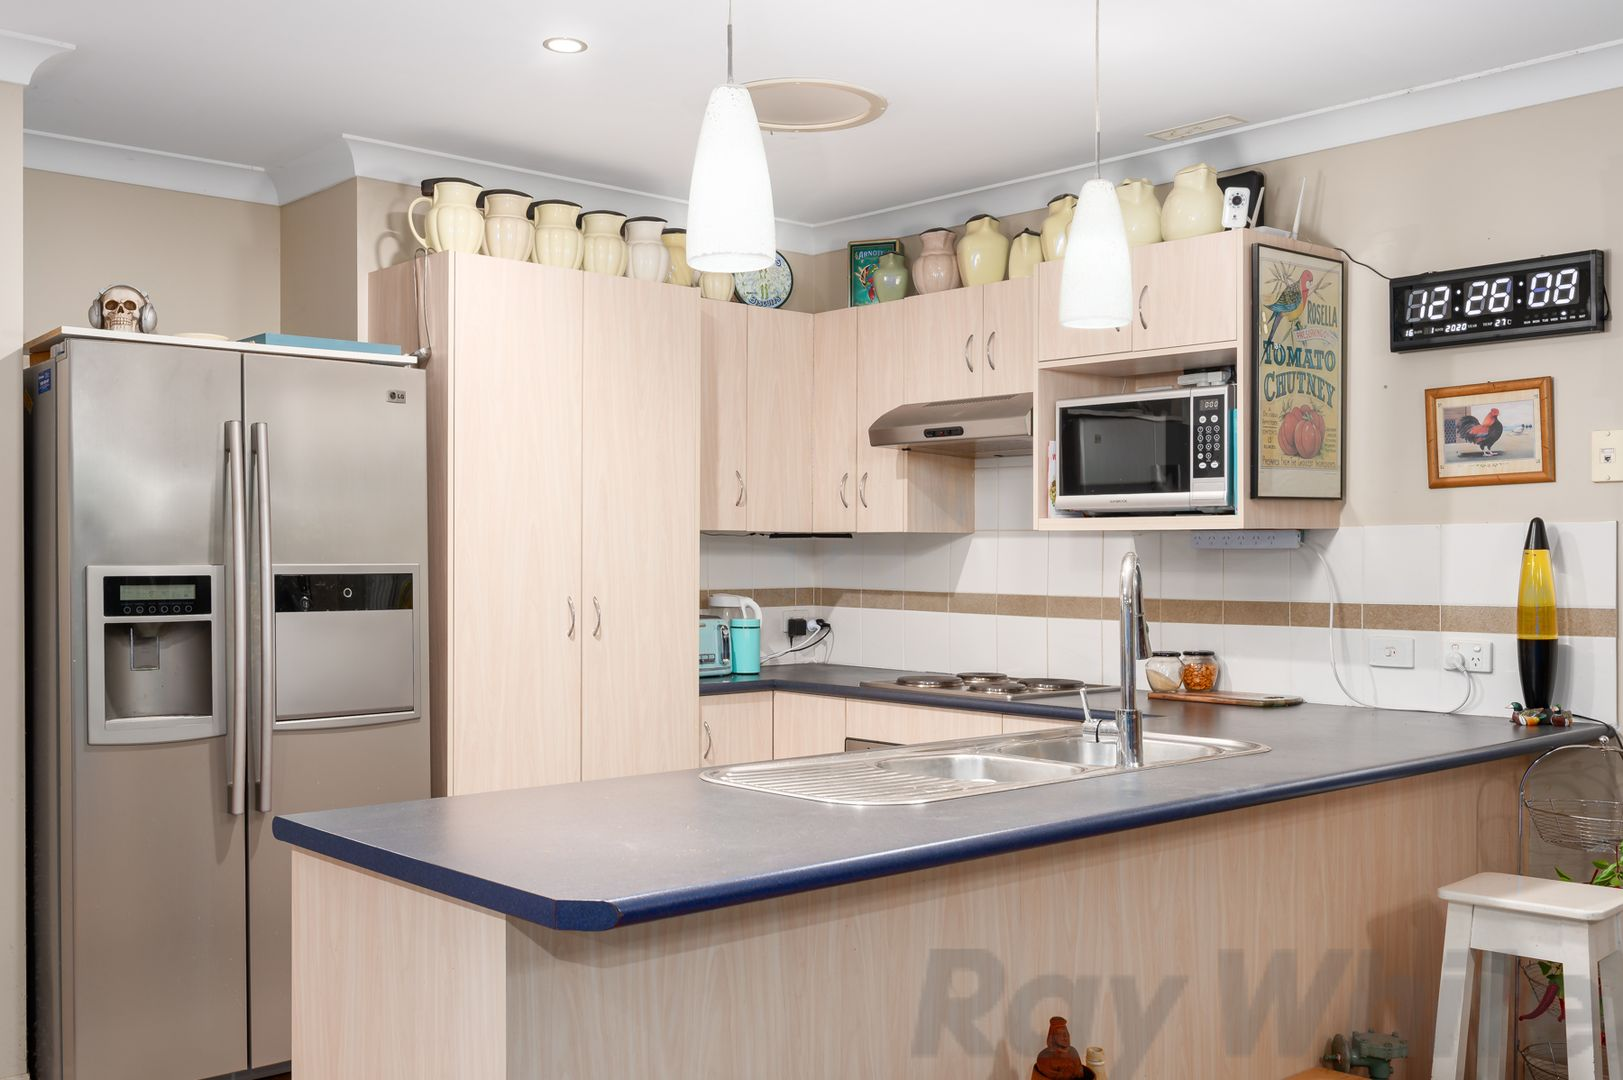 9 Stroud Street, Allworth Via, Stroud NSW 2425, Image 1